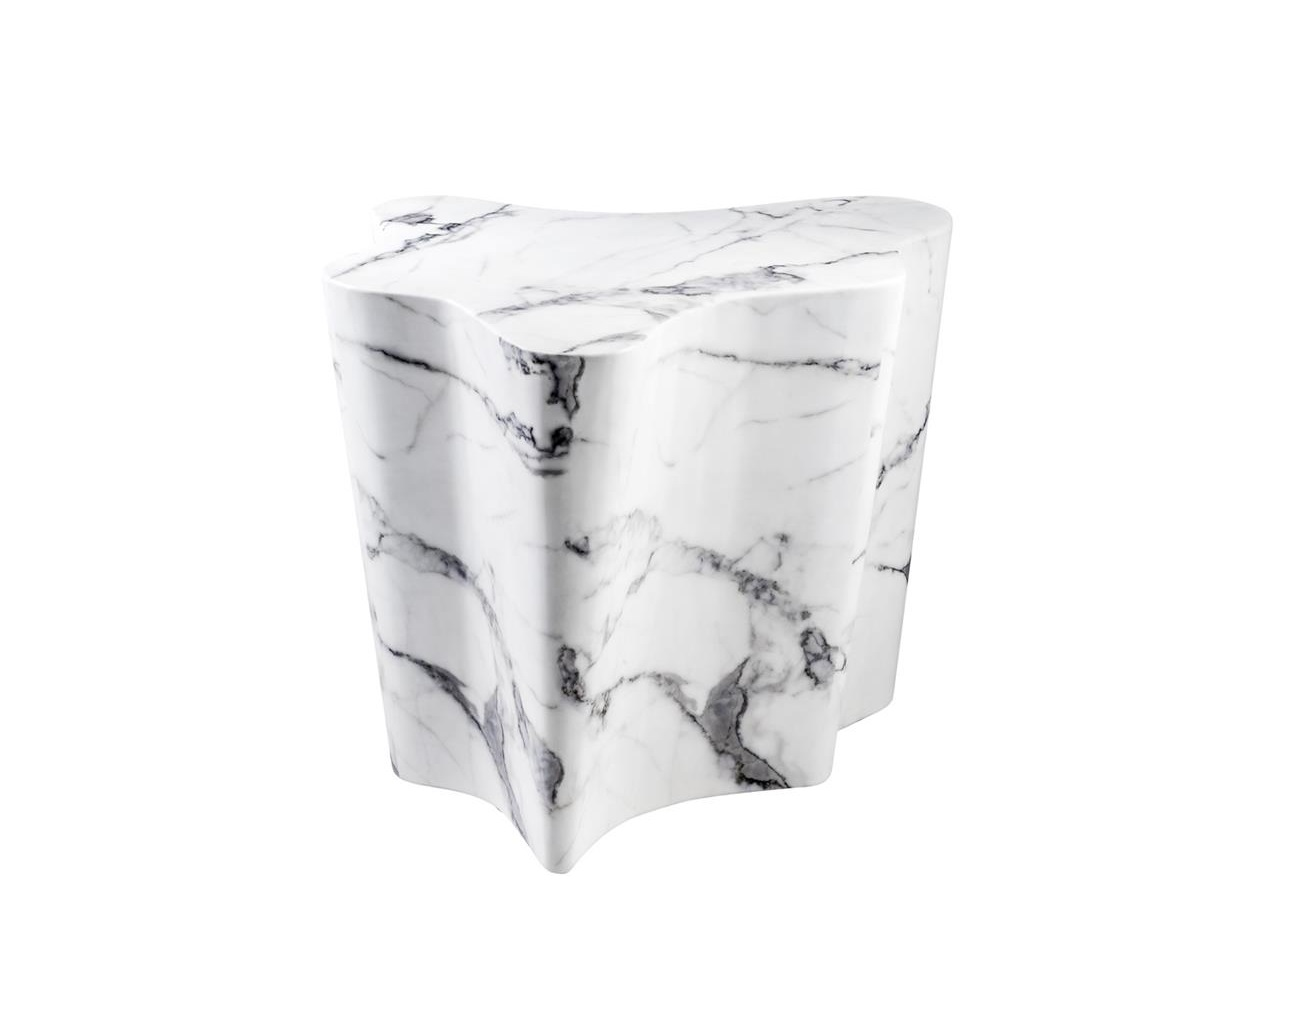 СтолПриставные столики<br>Столик Side Table Sceptre с имитацией мрамора глянцевого белого цвета.<br><br>Material: Мрамор<br>Ширина см: 68<br>Высота см: 56<br>Глубина см: 62